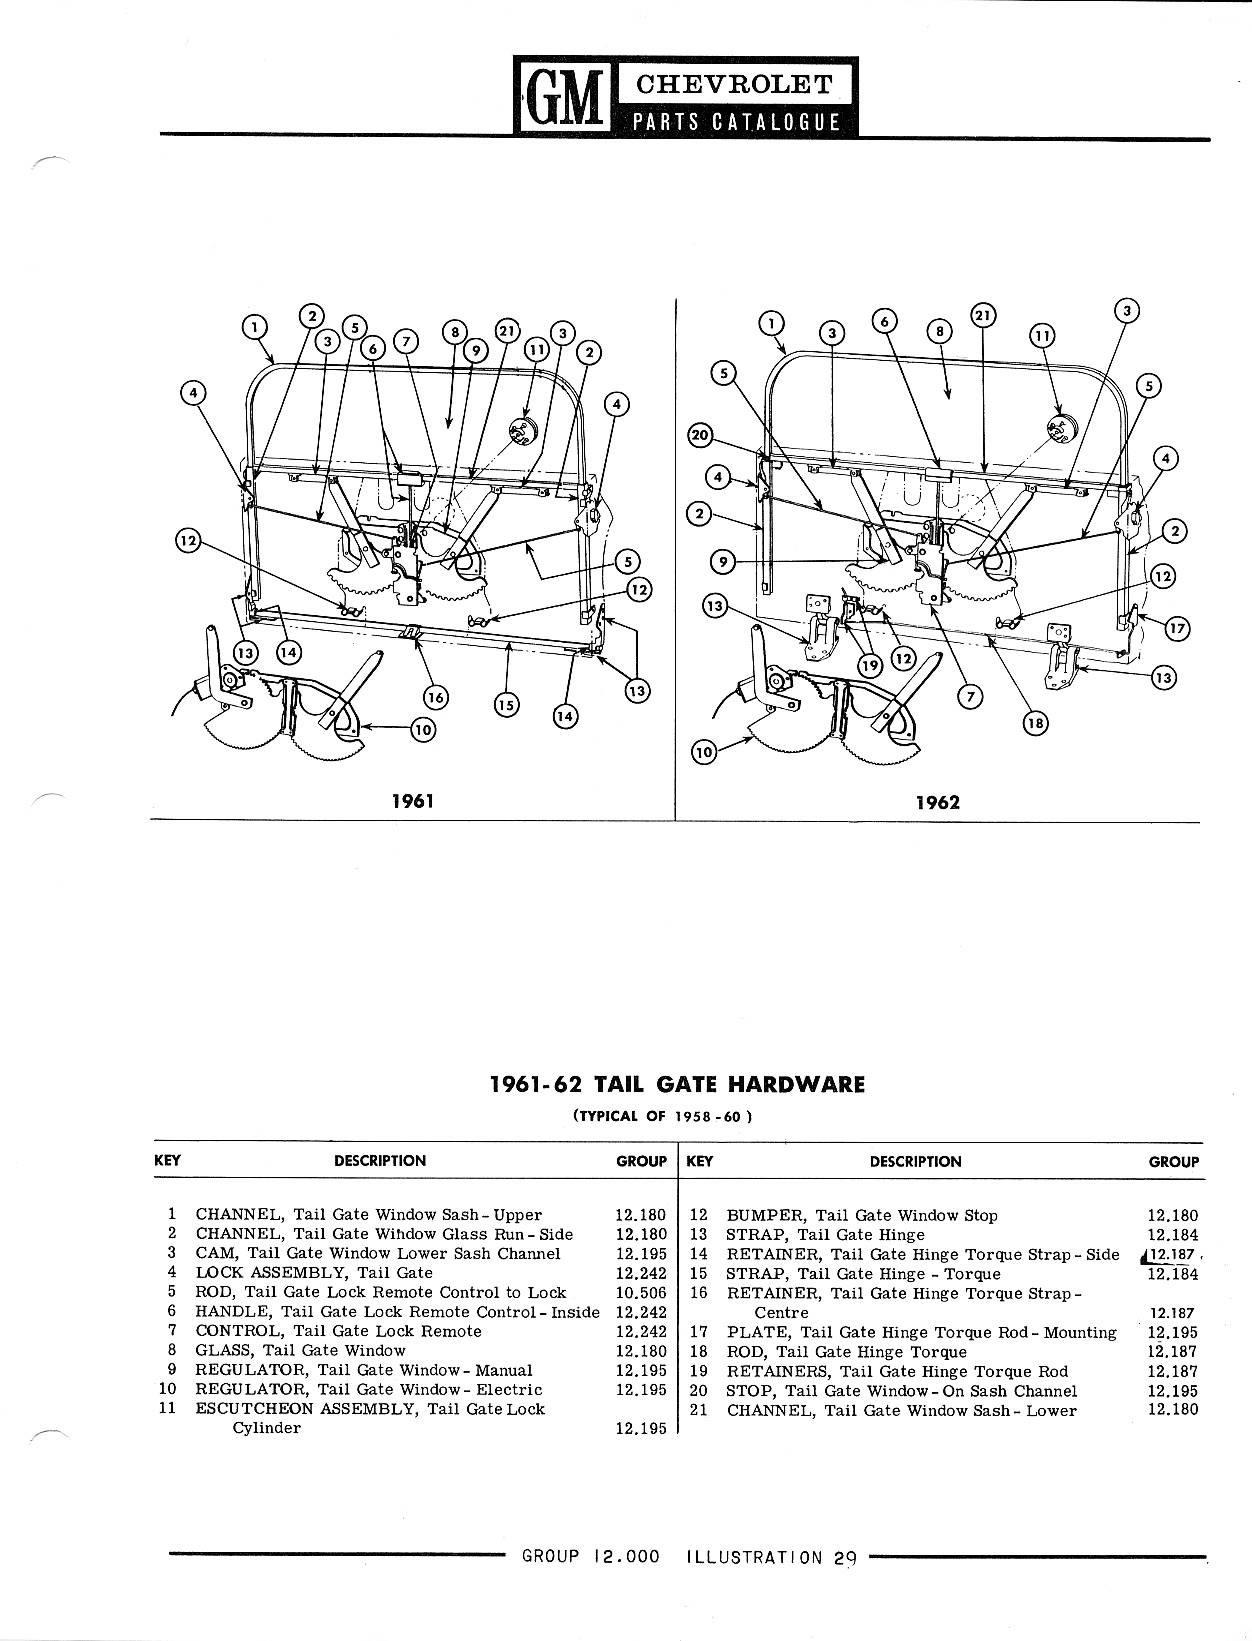 1958-1968 Chevrolet Parts Catalog / Image185.jpg